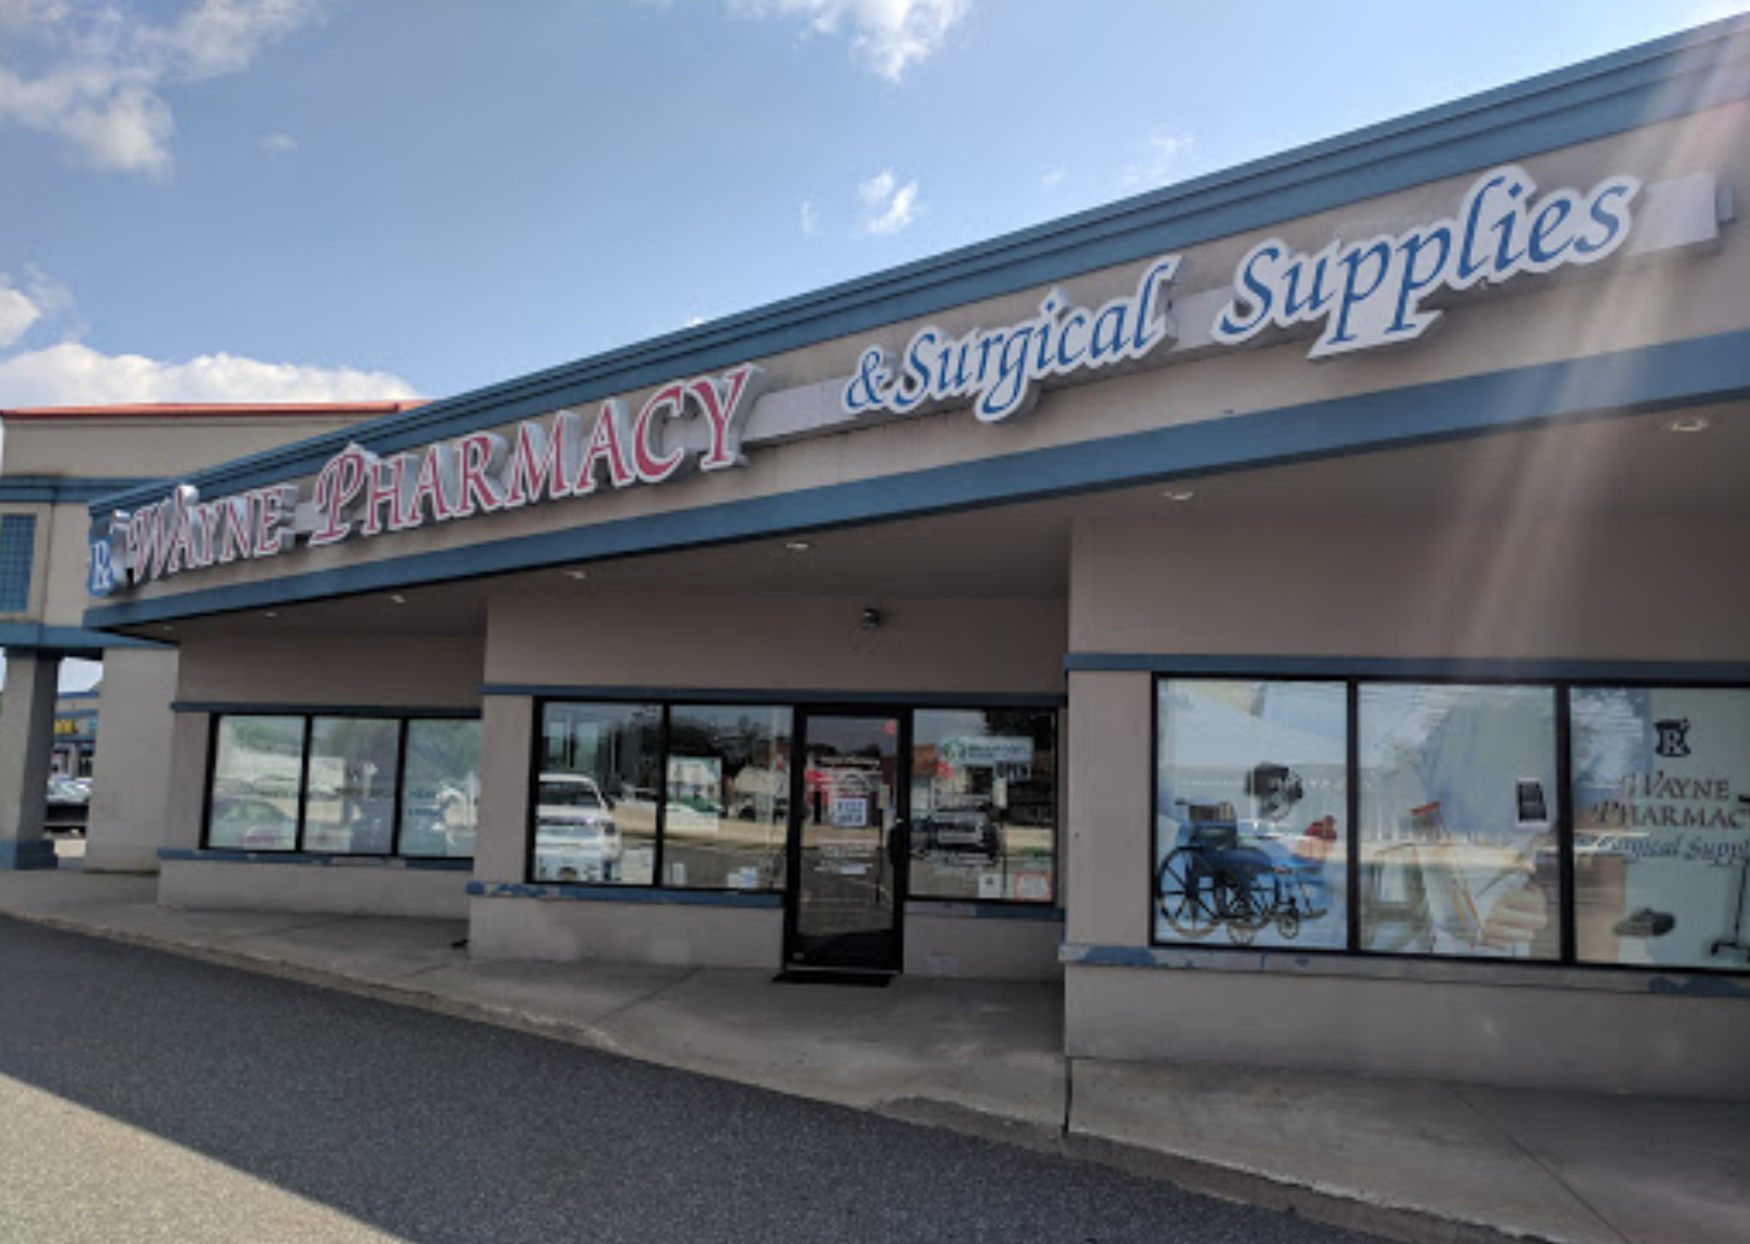 Wayne Pharmacy & Surgical Supplies